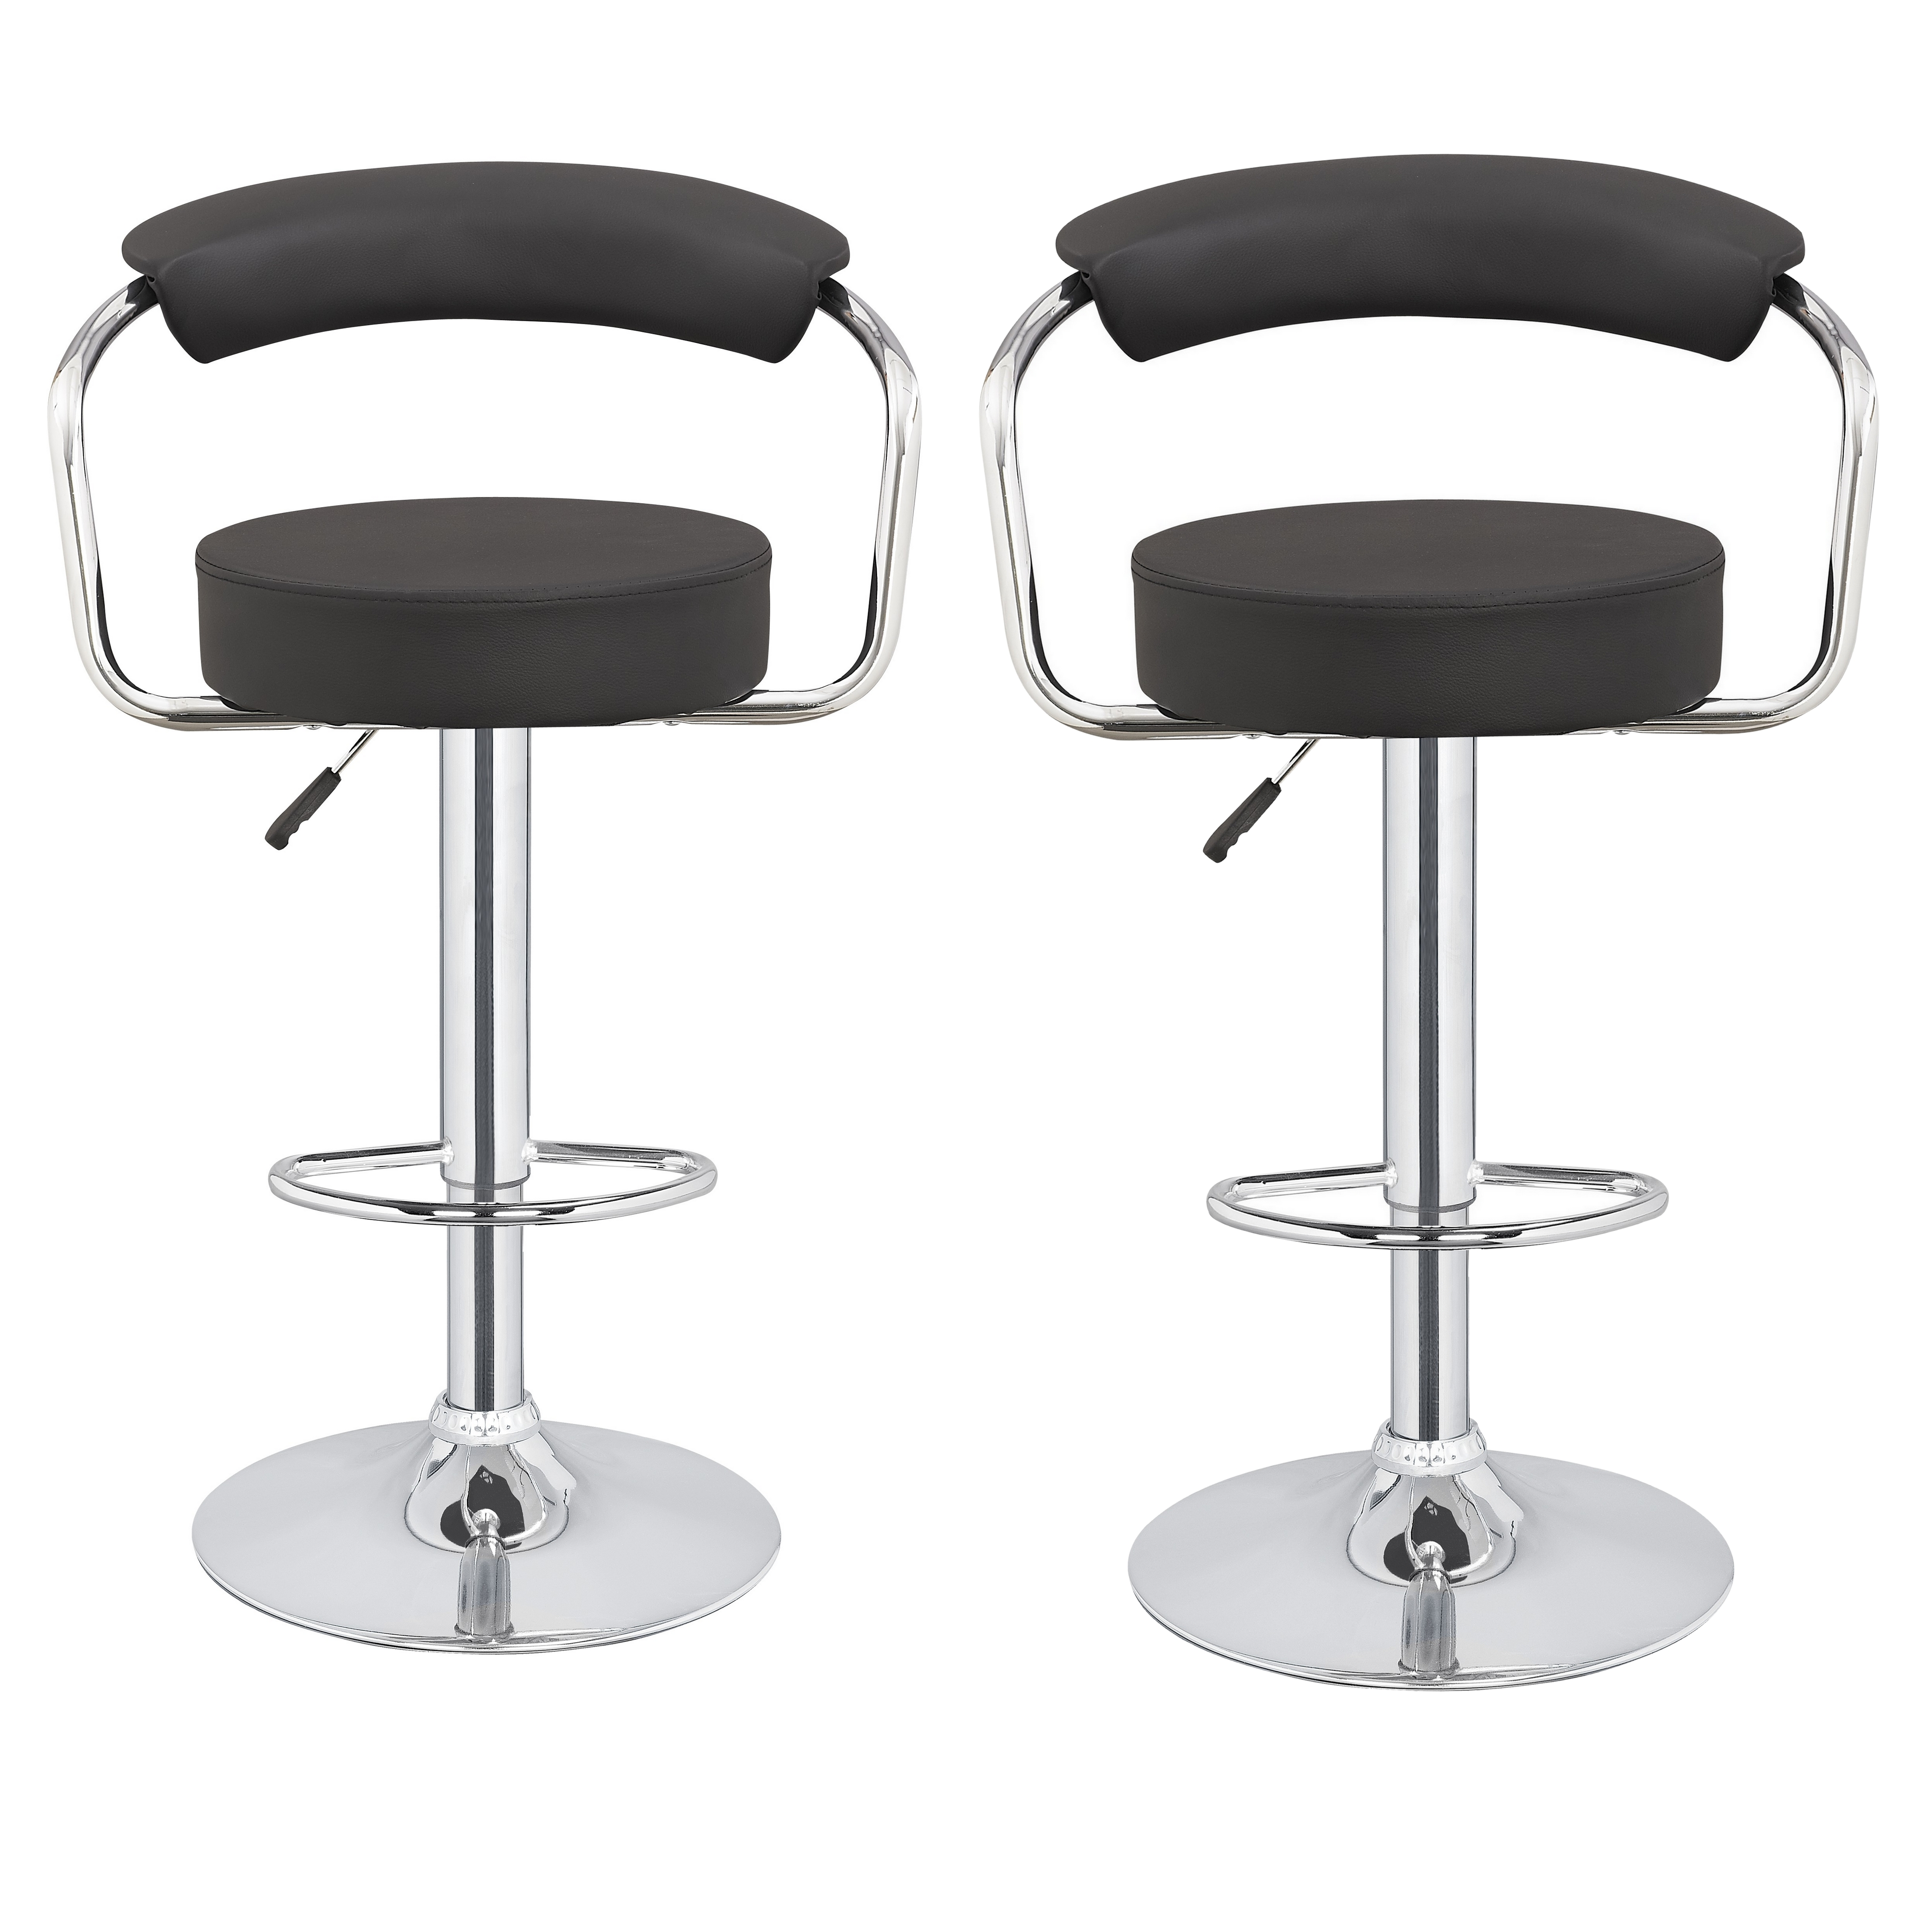 2 x Homegear M1 50s Diner Adjustable Swivel Faux Leather  : 2xAXHG 0100a from www.ebay.com size 4000 x 4000 jpeg 2398kB